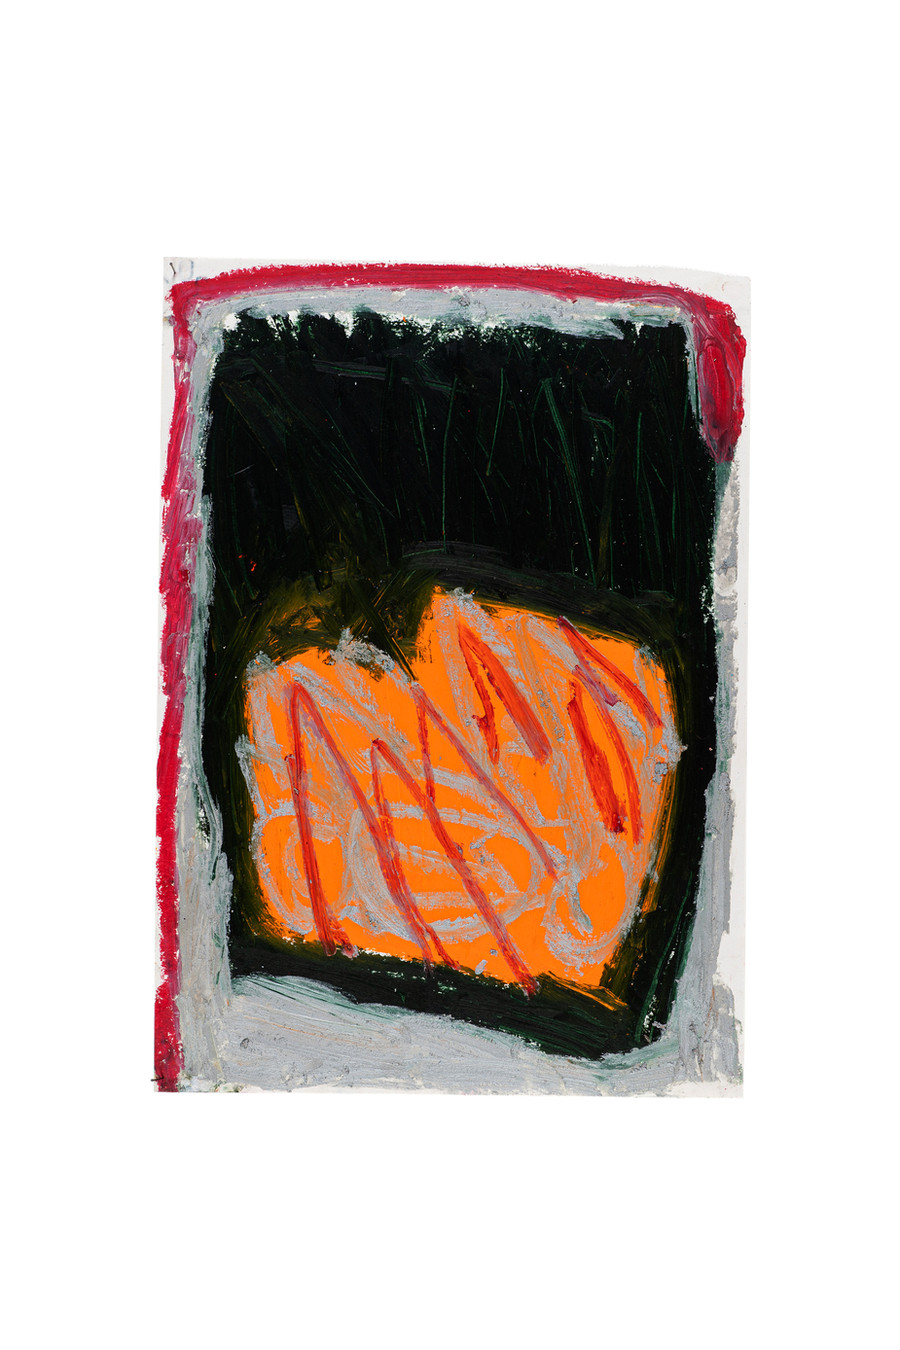 Vicente Saraiva, sem título, 2020, Barra de Oleo sob papel, 60 x 42cm